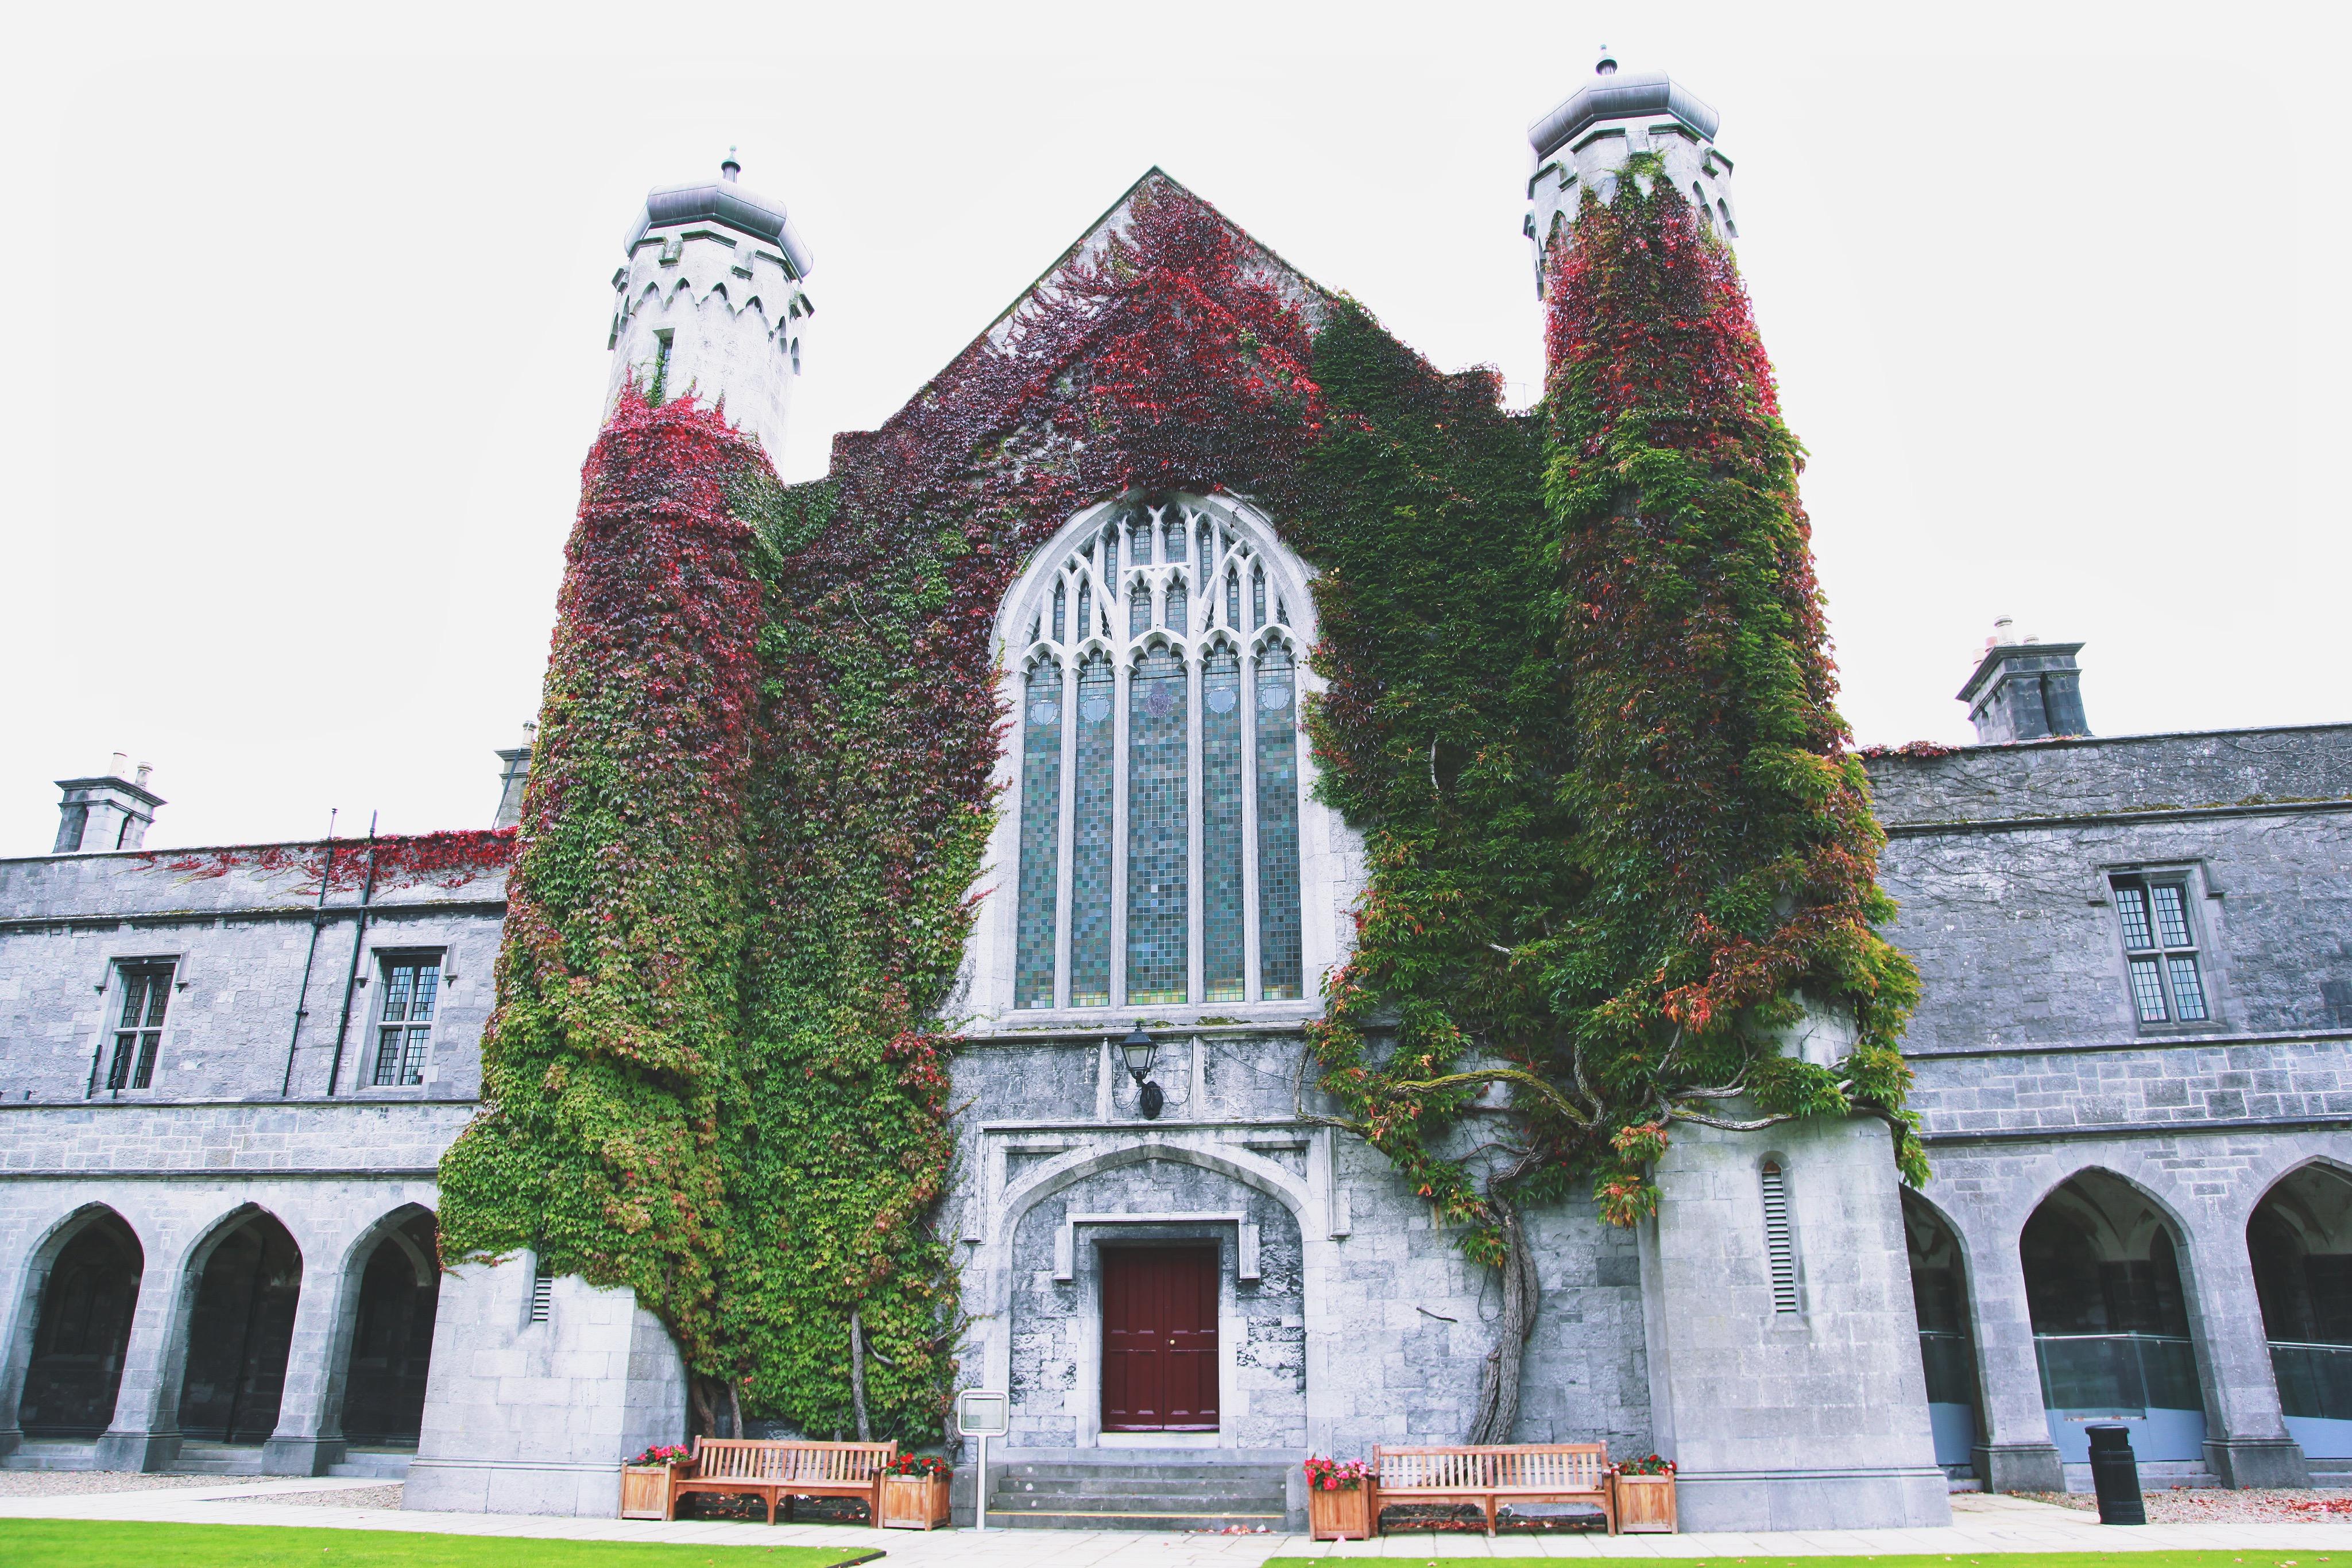 Ireland College